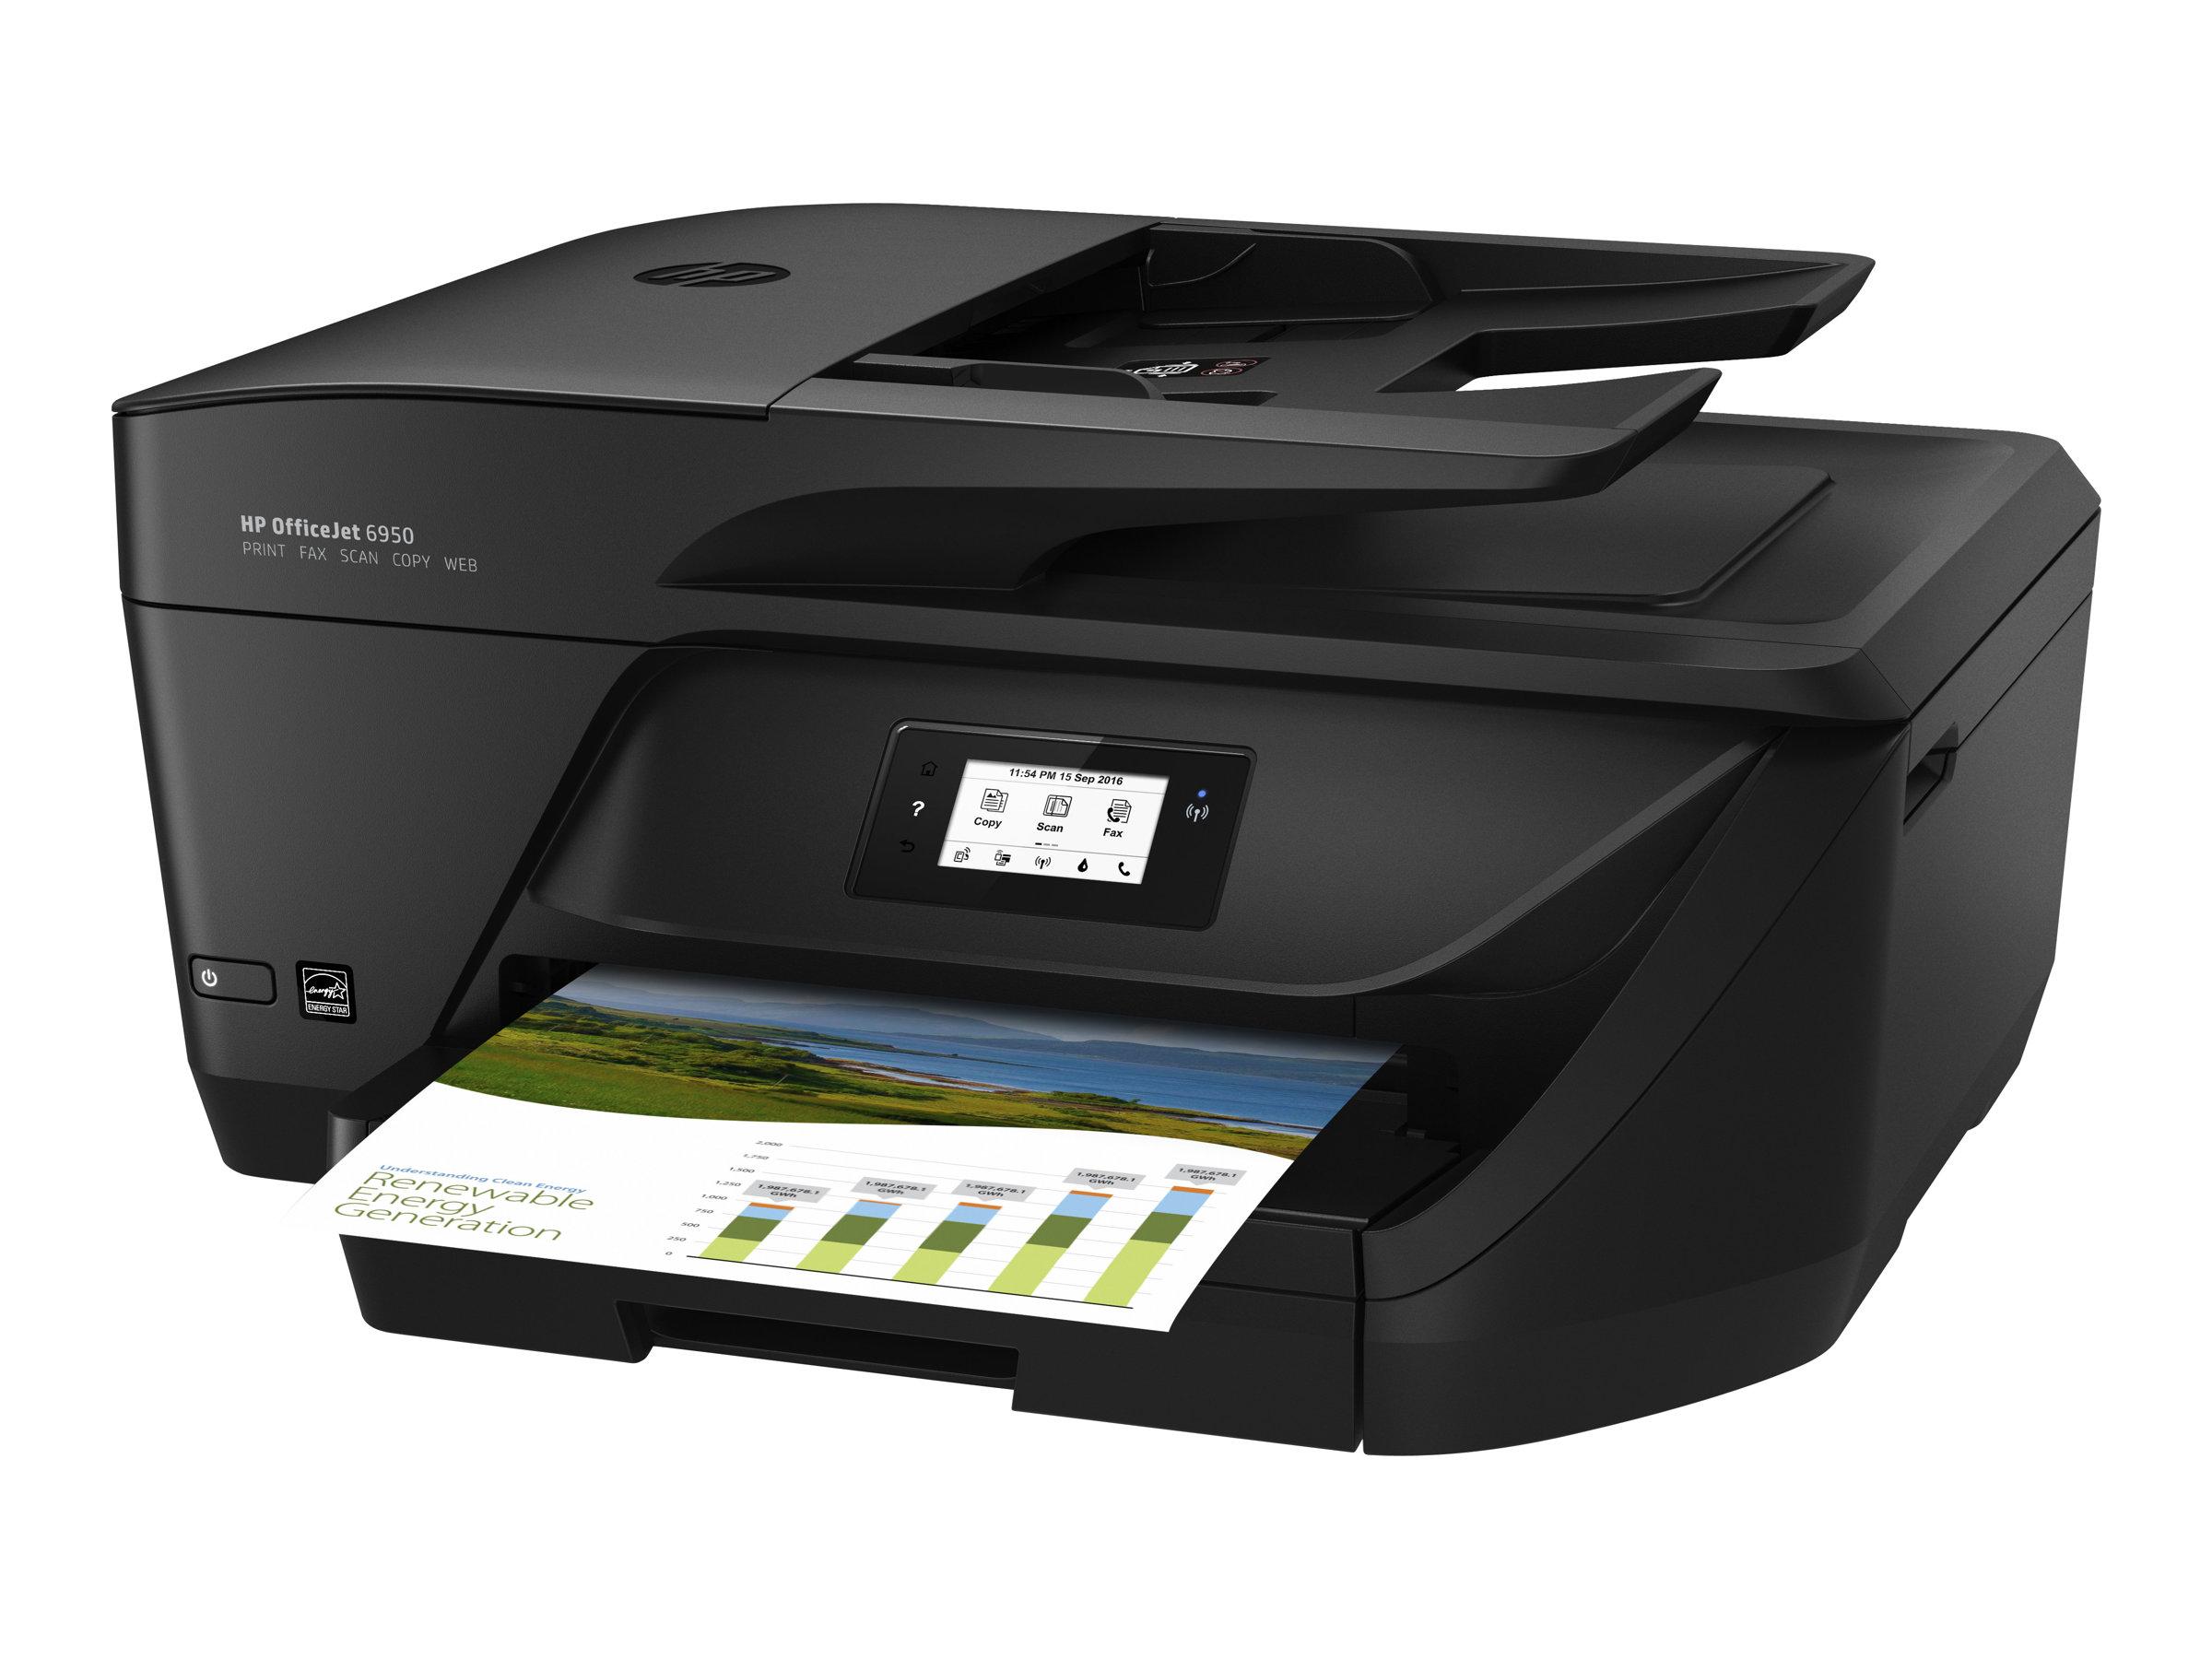 HP Officejet 6950 All-in-One - Multifunktionsdrucker - Farbe - Tintenstrahl - Legal (216 x 356 mm)